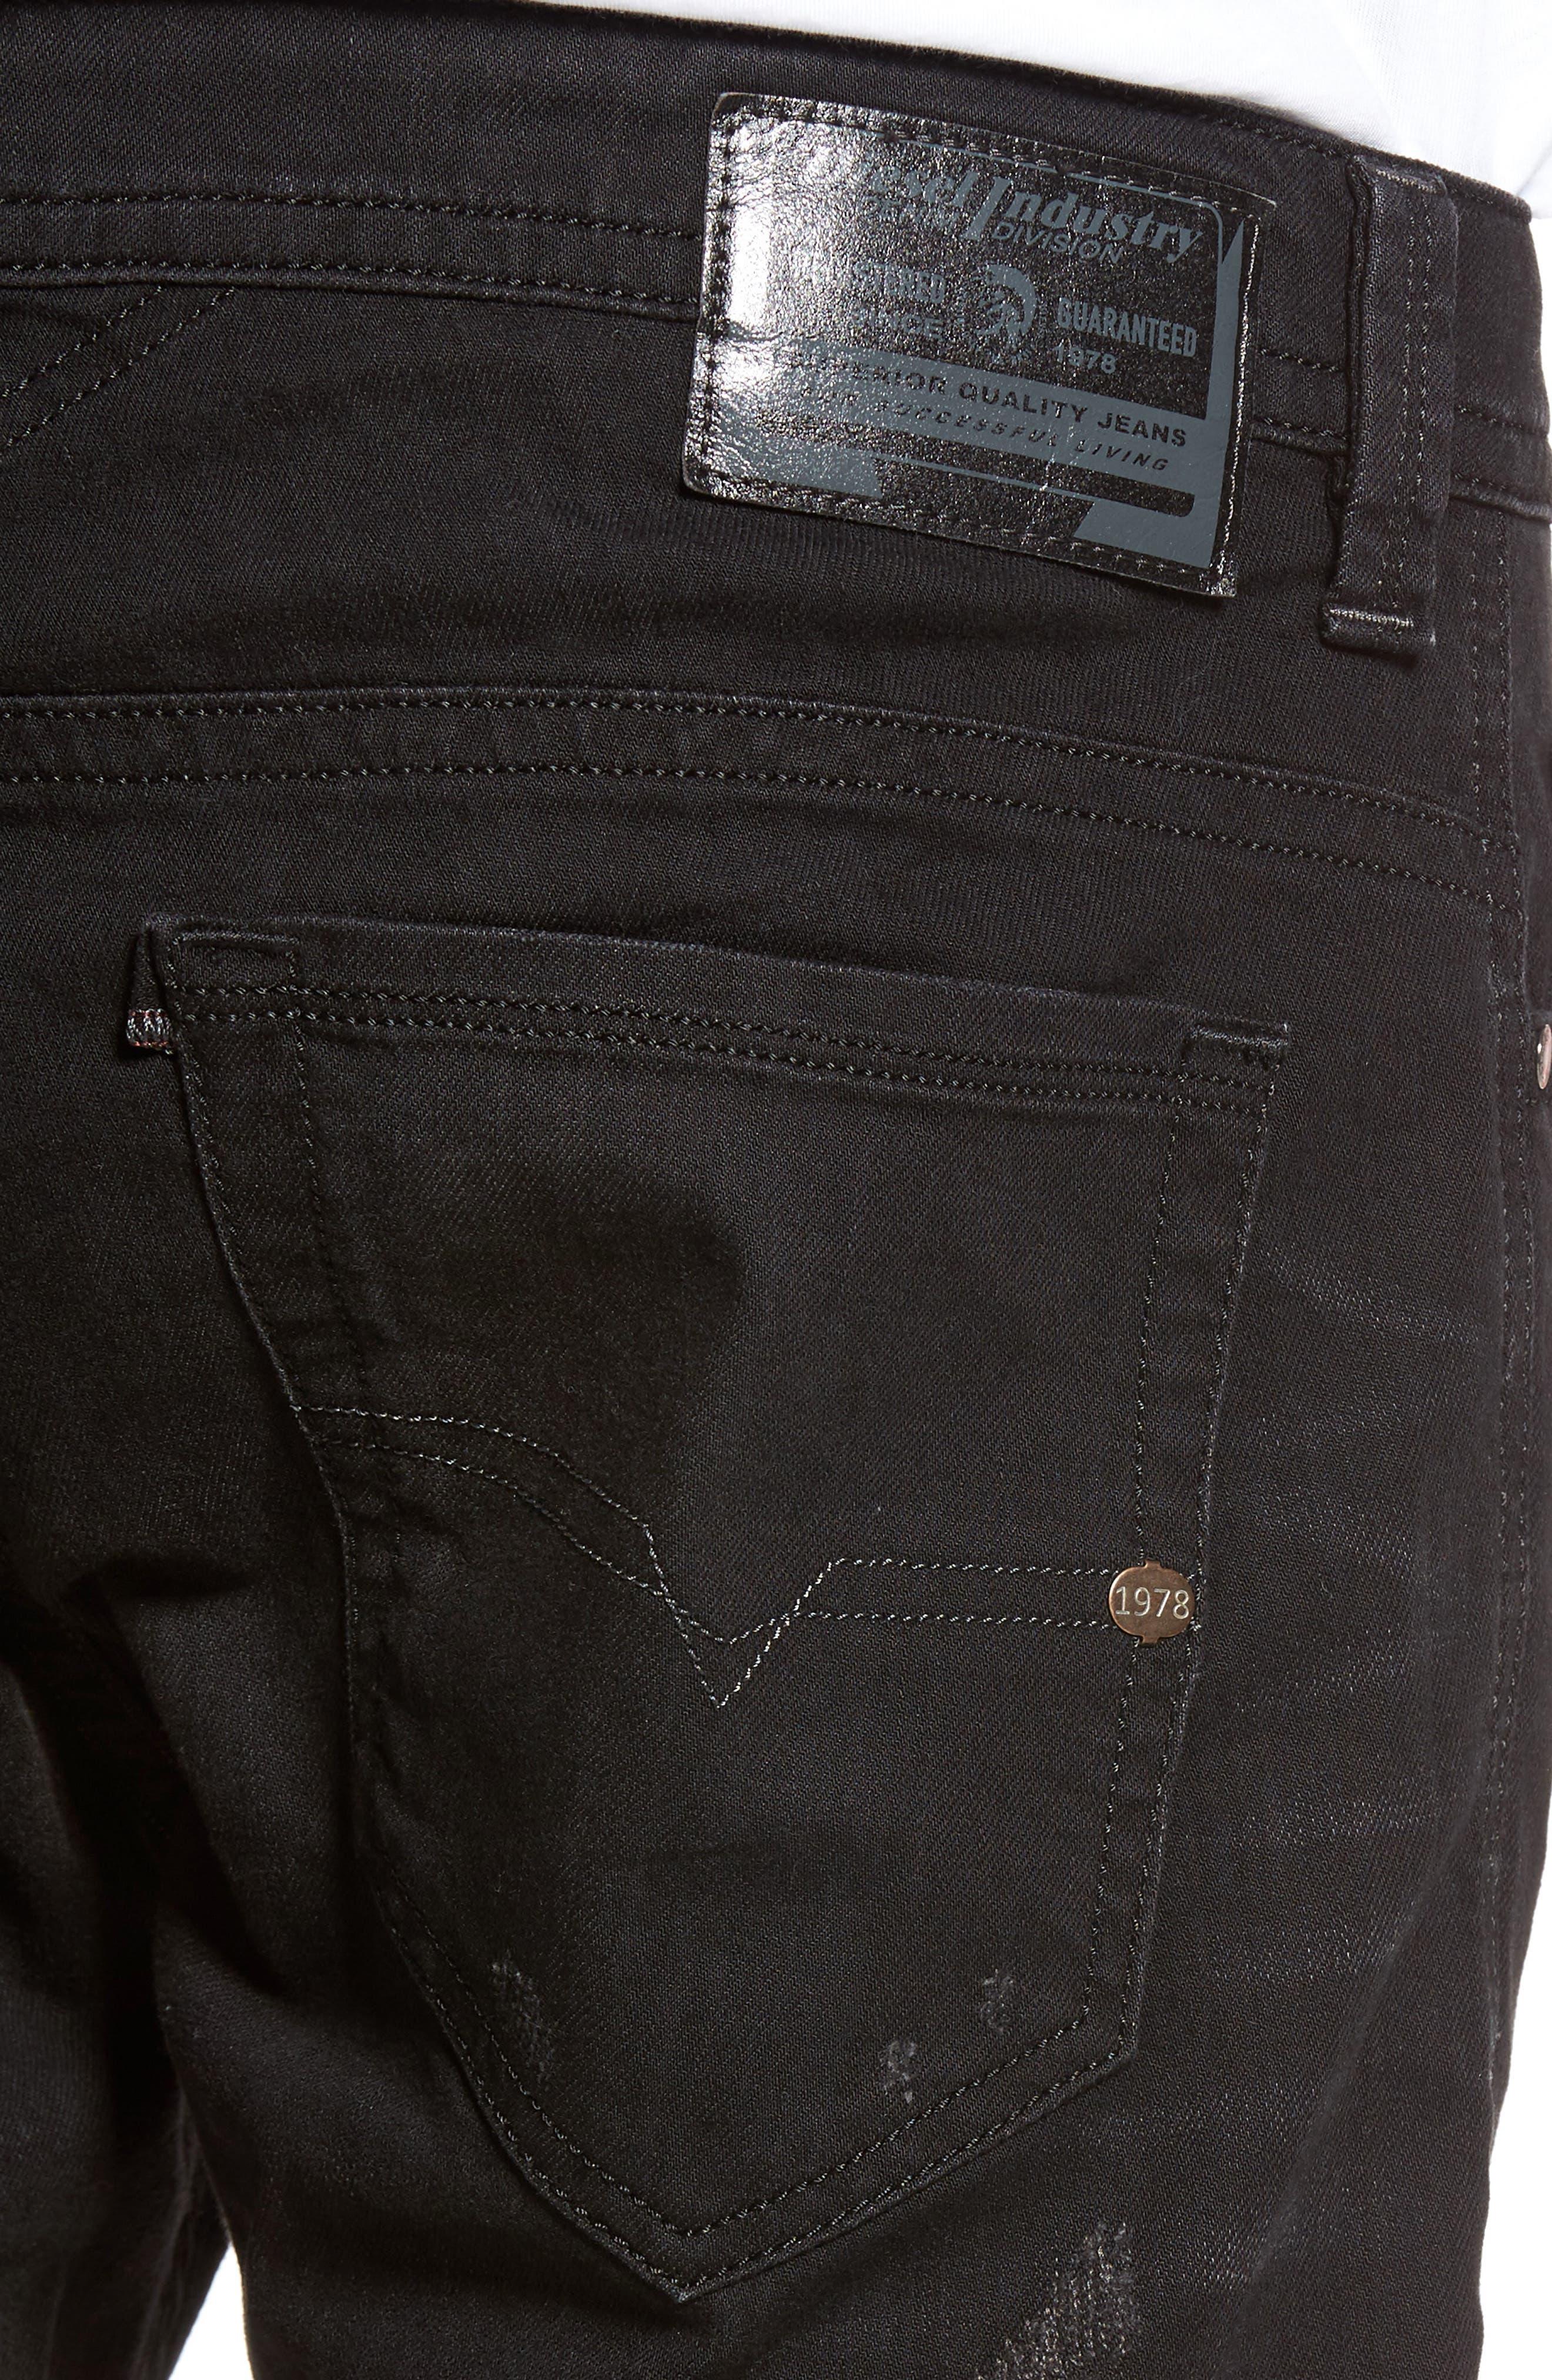 Thavar Skinny Fit Jeans,                             Alternate thumbnail 4, color,                             008